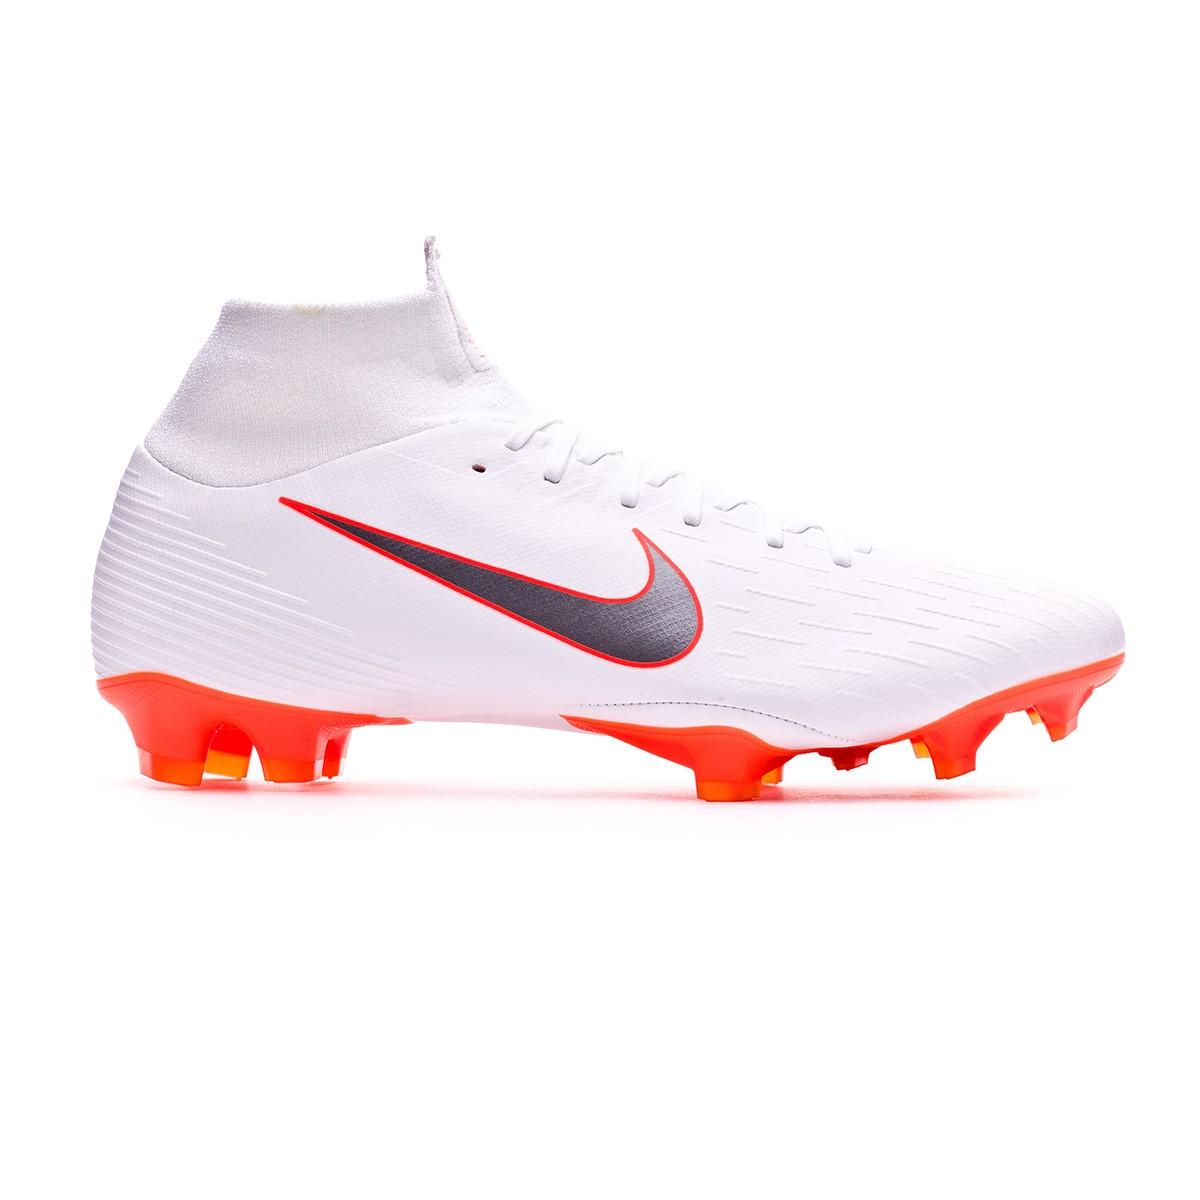 7cee3e6a518 Football Boots Nike Mercurial Superfly VI Pro FG White-Metallic cool grey-Total  orange - Football store Fútbol Emotion